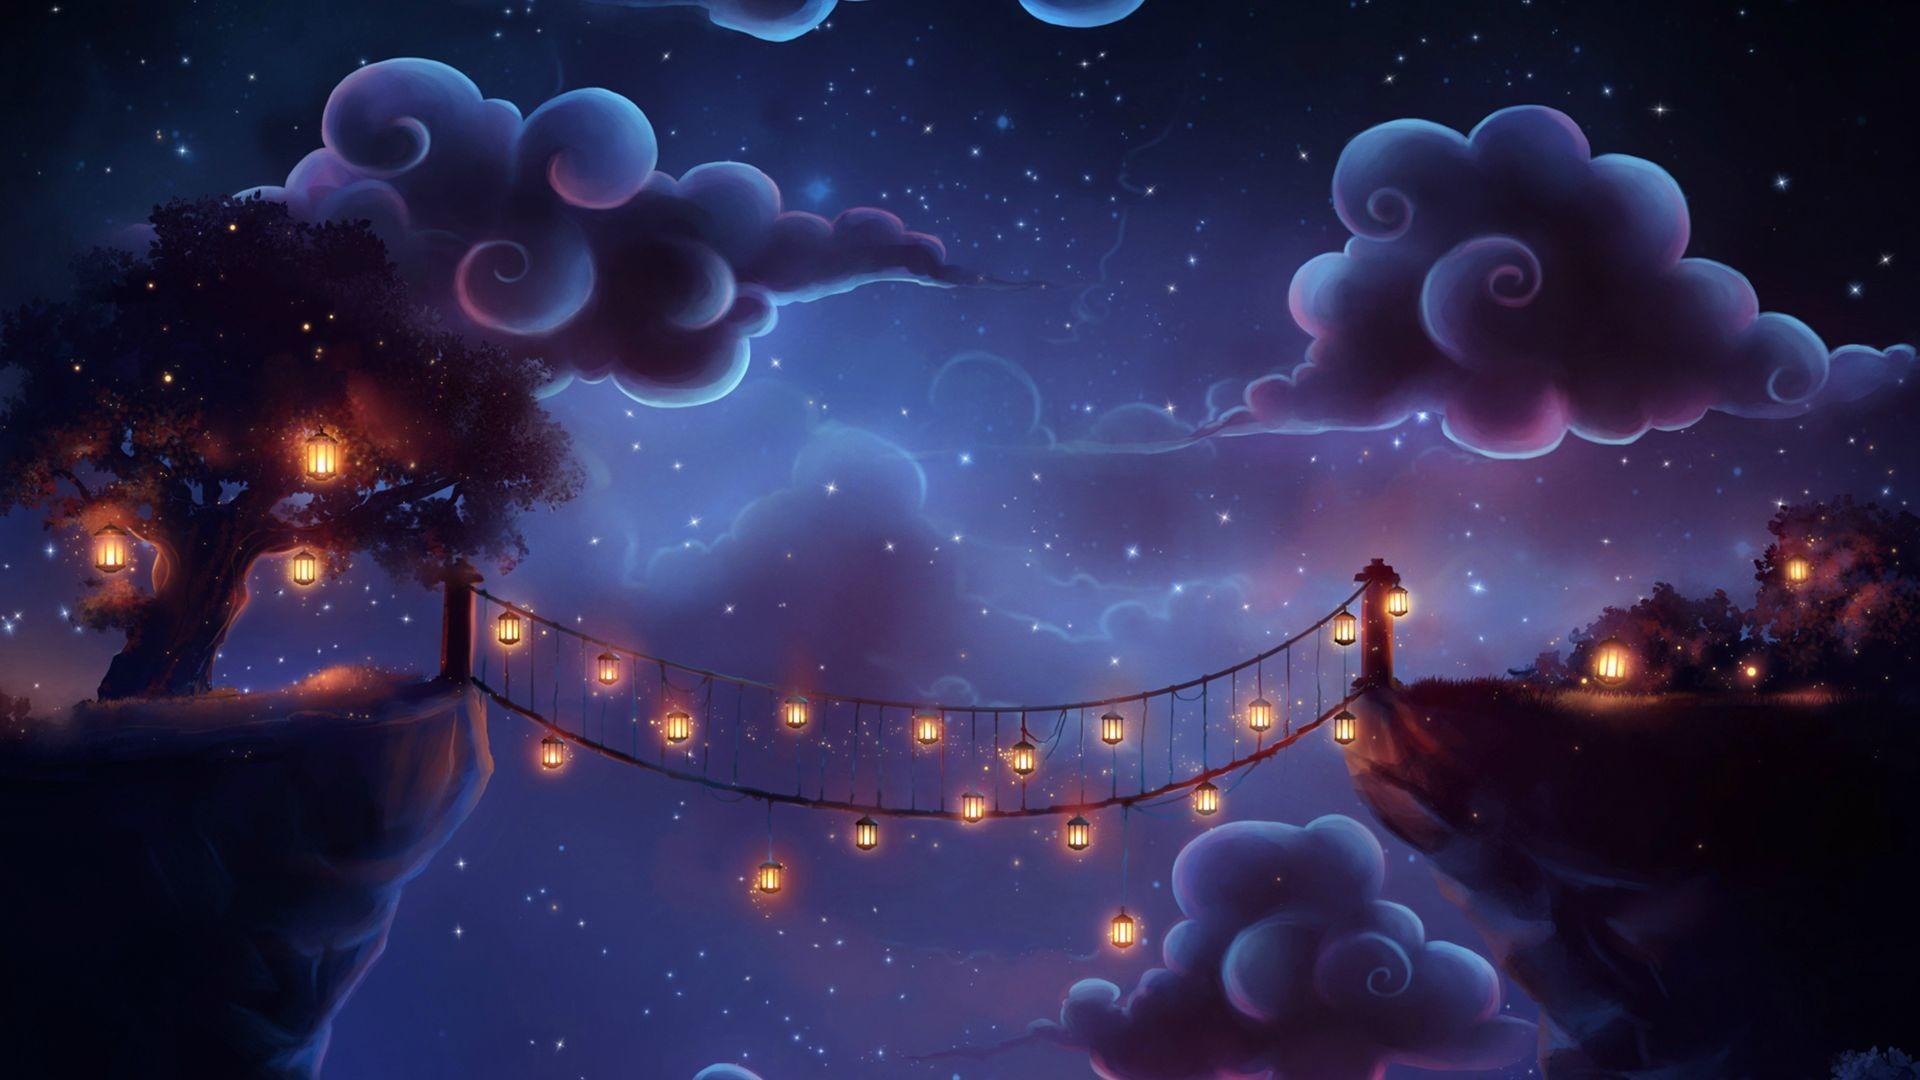 Fantasy and Illustration Wallpaper | Pinterest